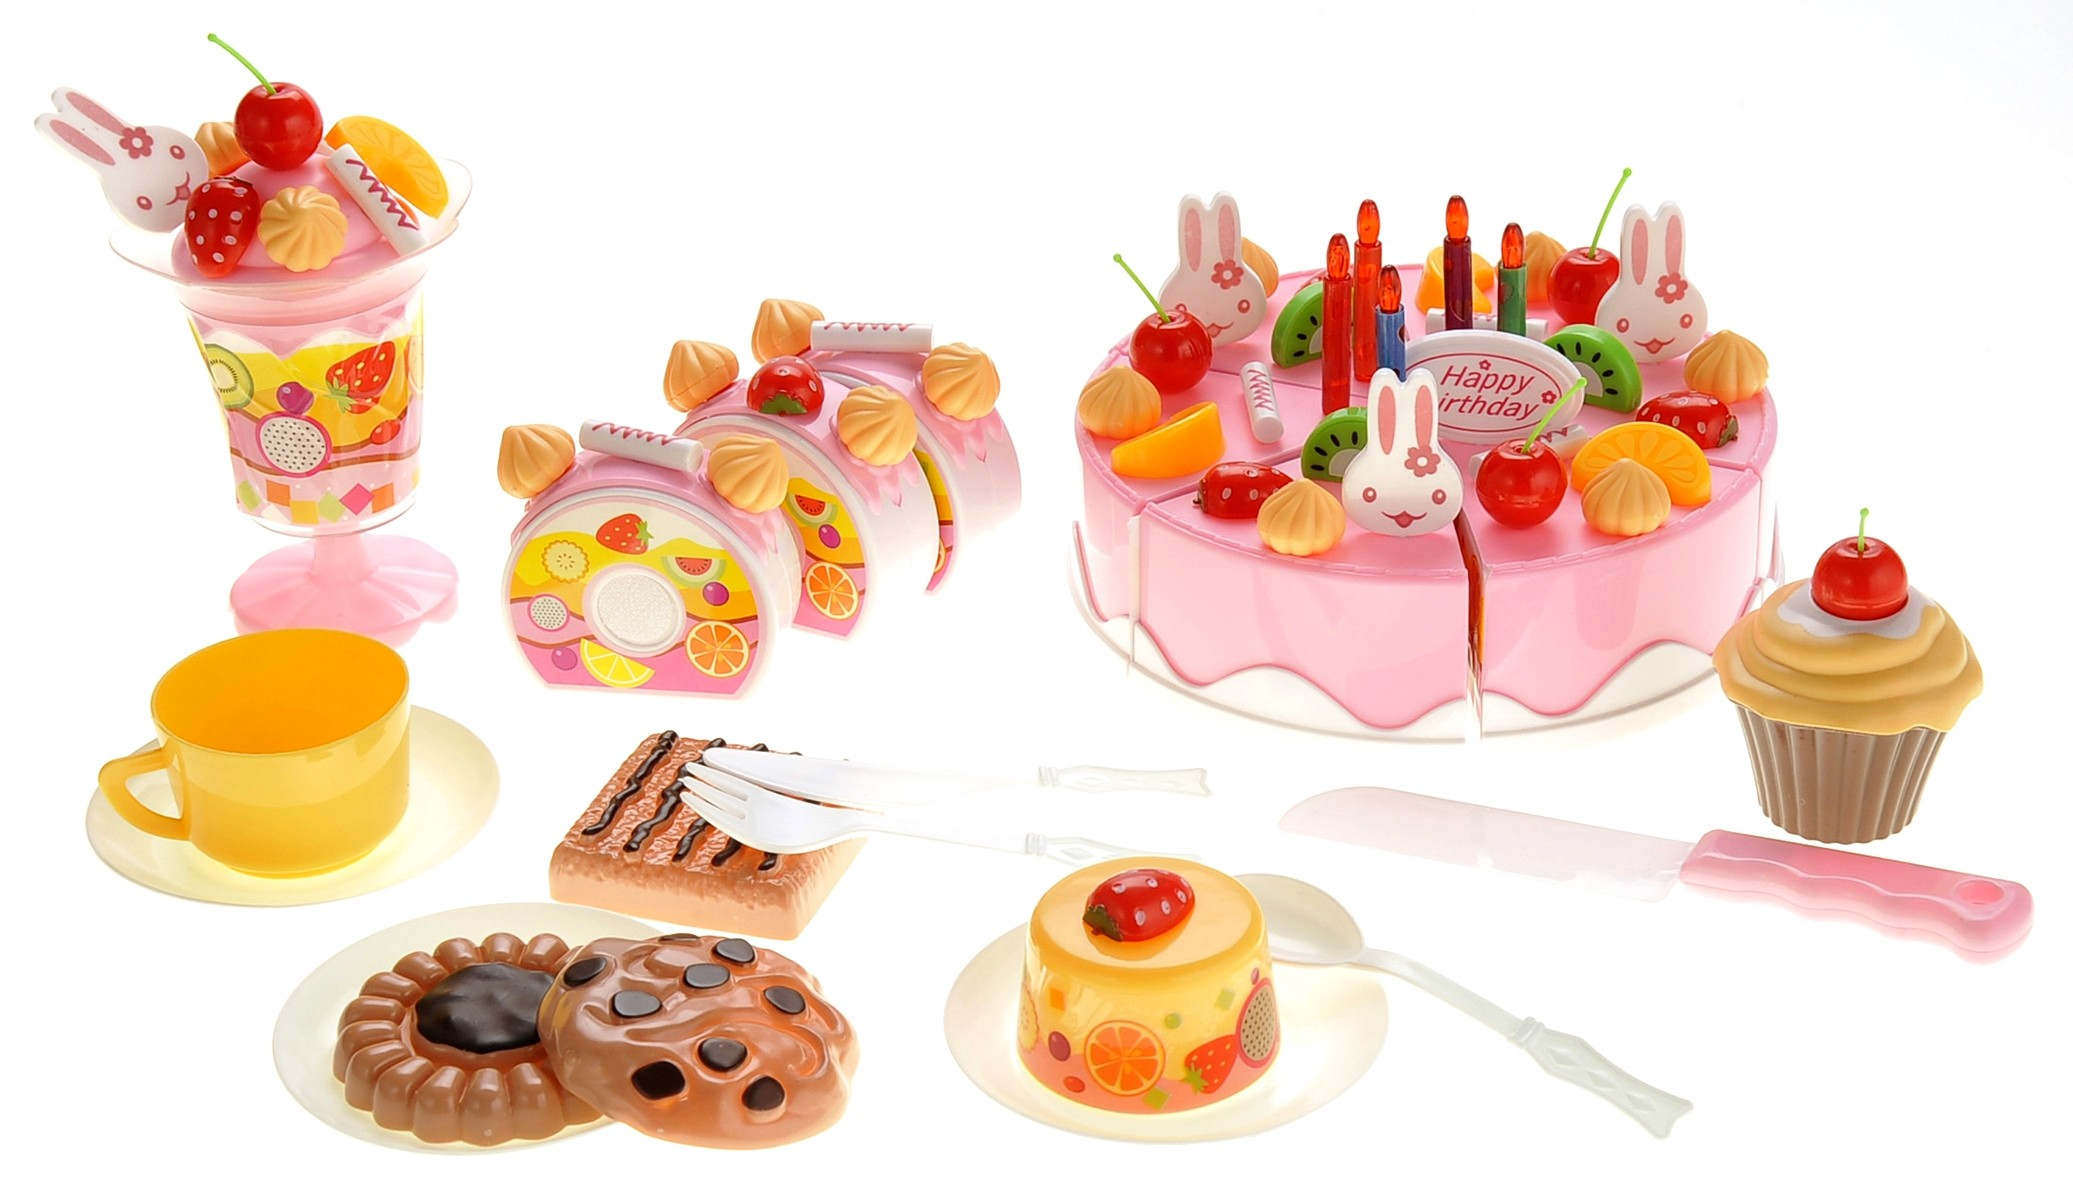 Birthday Cake 75pcs Pretend Play Food Toy Set (Pink)